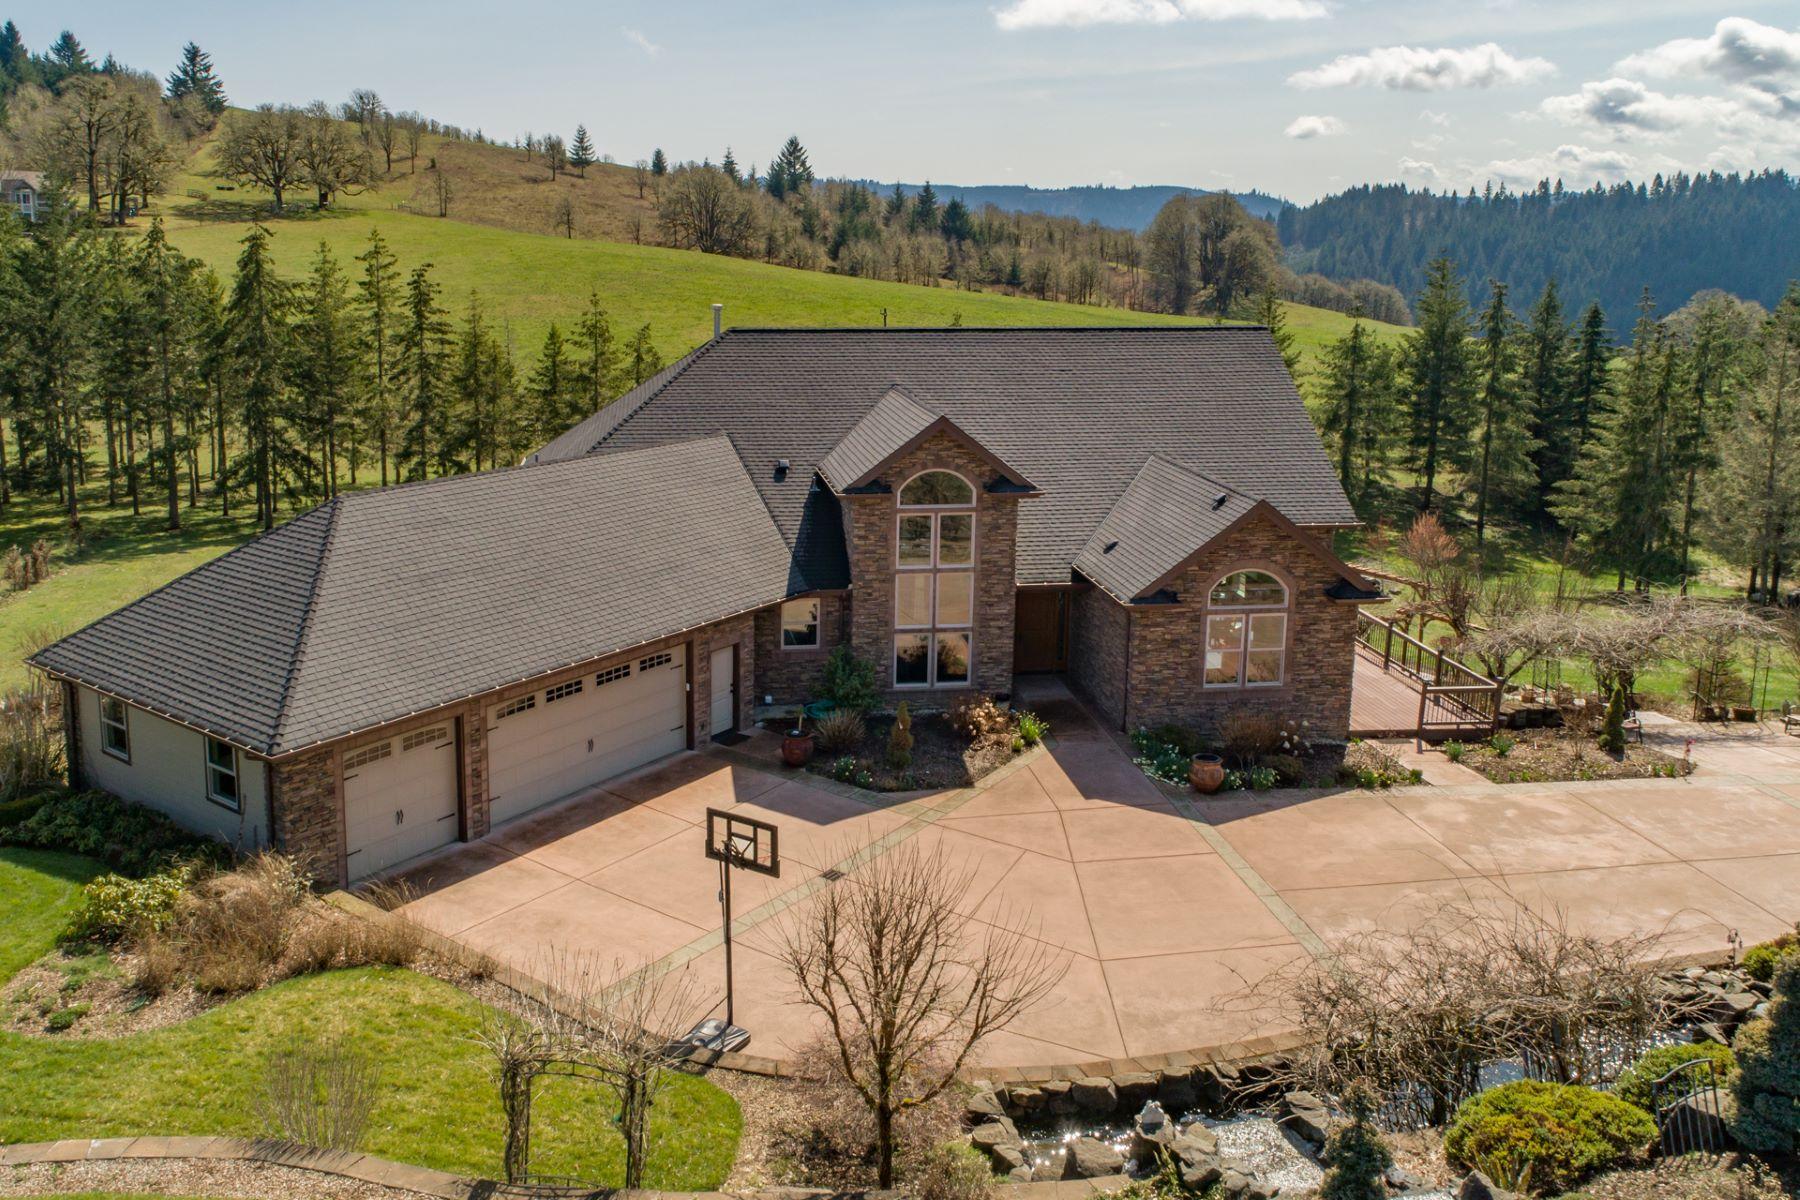 Other Residential Homes για την Πώληση στο 24244 FINCH LN Philomath, OR 97370 Philomath, Ορεγκον 97370 Ηνωμένες Πολιτείες